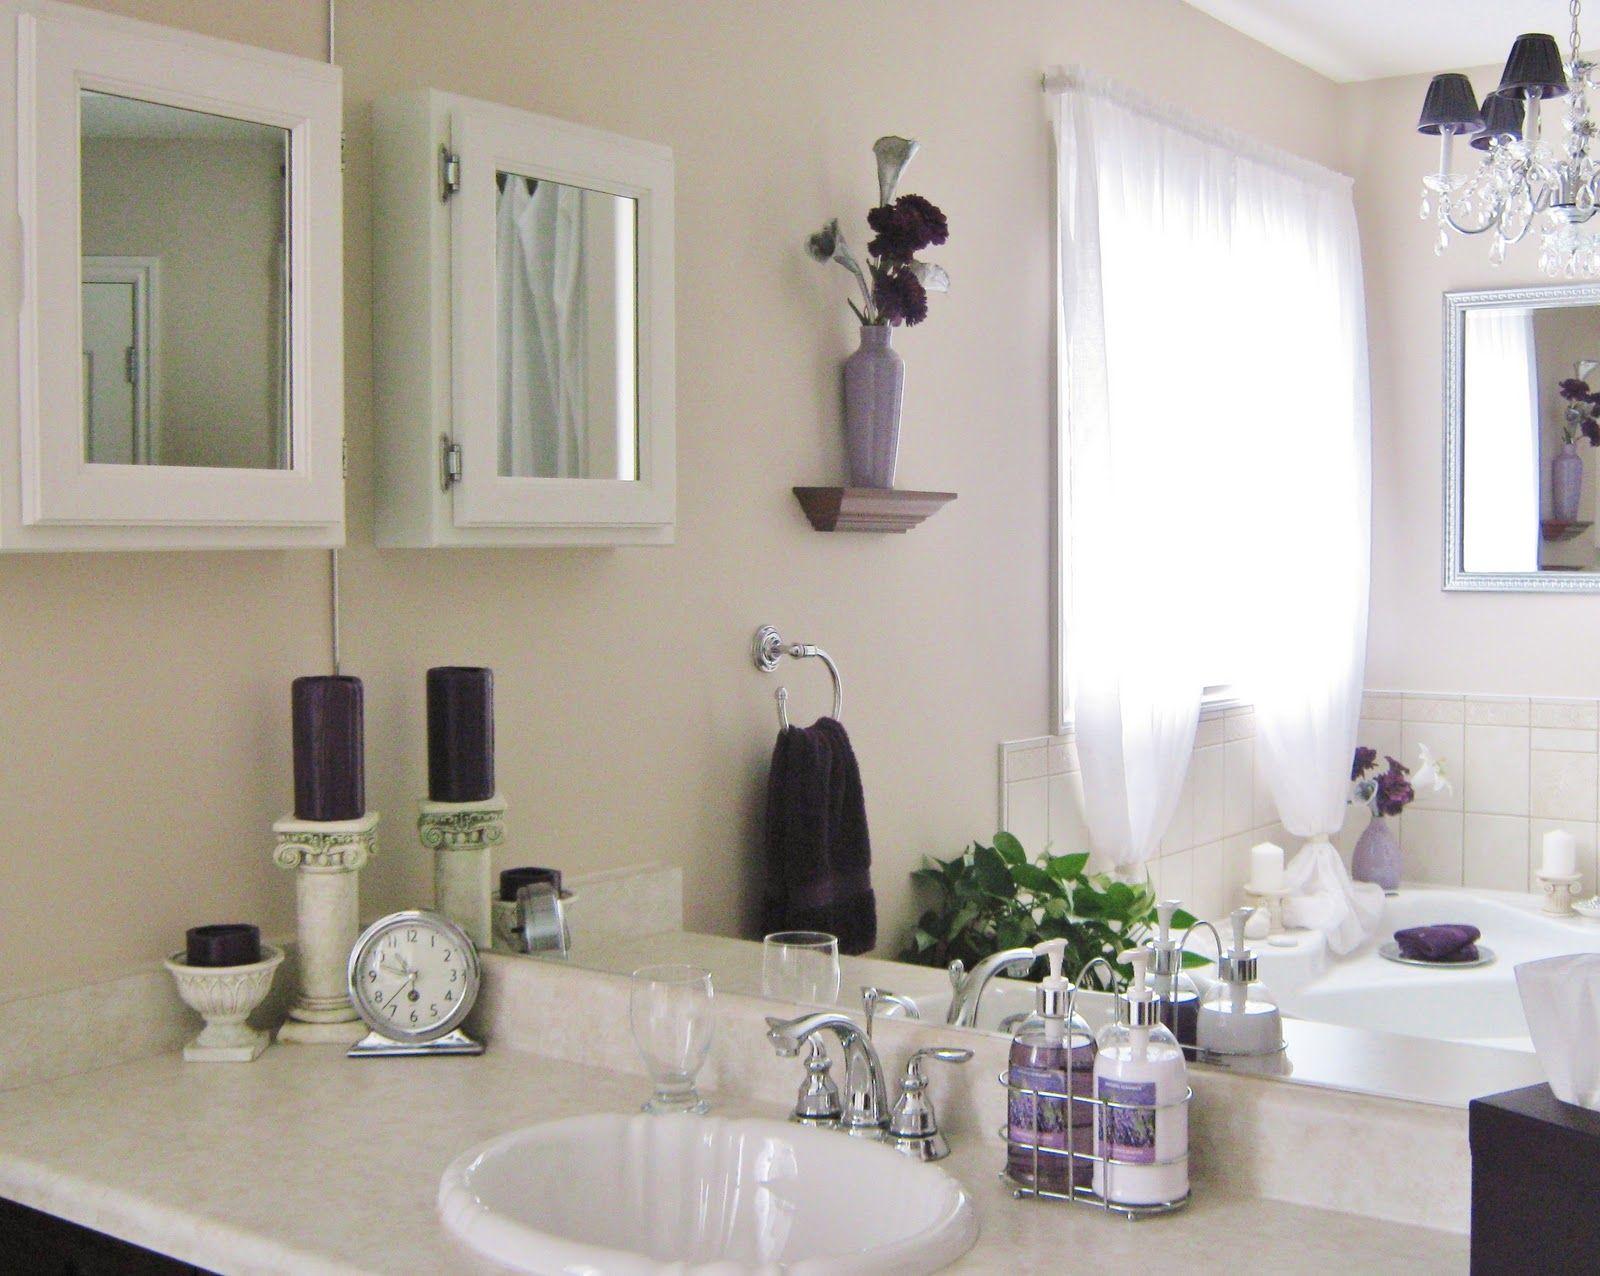 White Bathroom Vanity Decorating Ideas House White